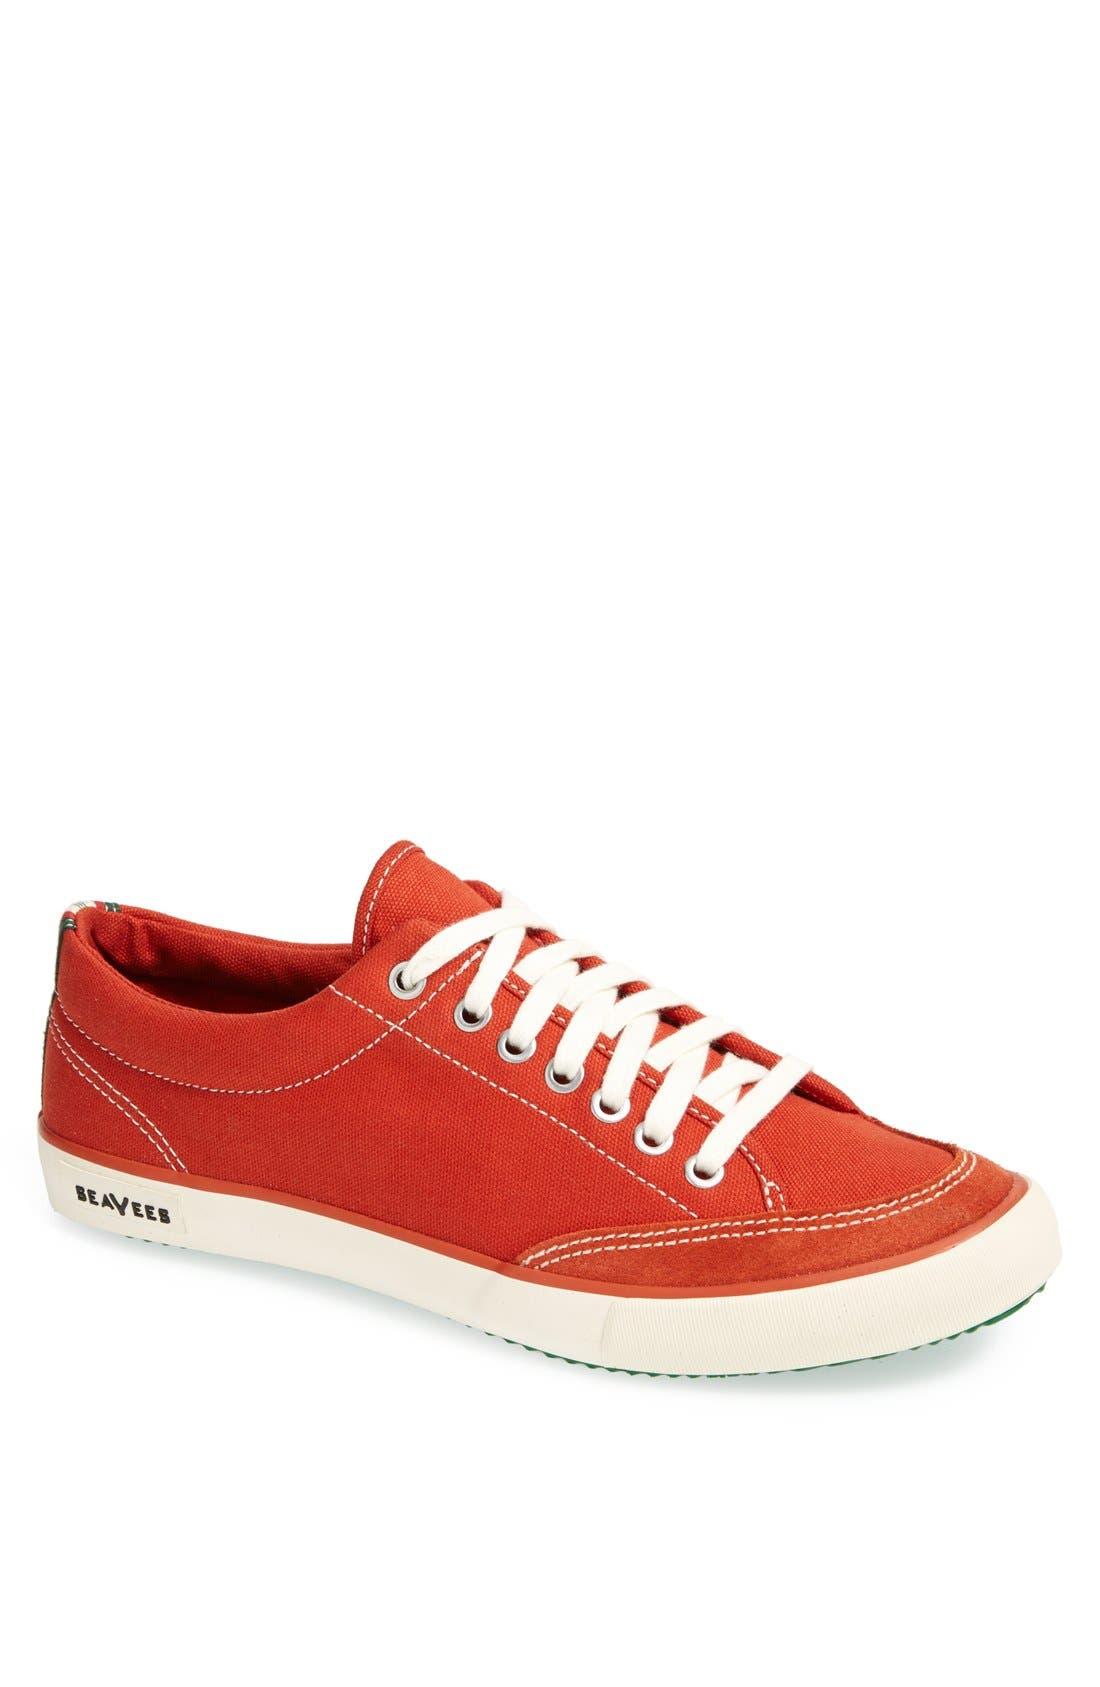 Main Image - SeaVees '05/65 - Westwood' Tennis Shoe (Men)